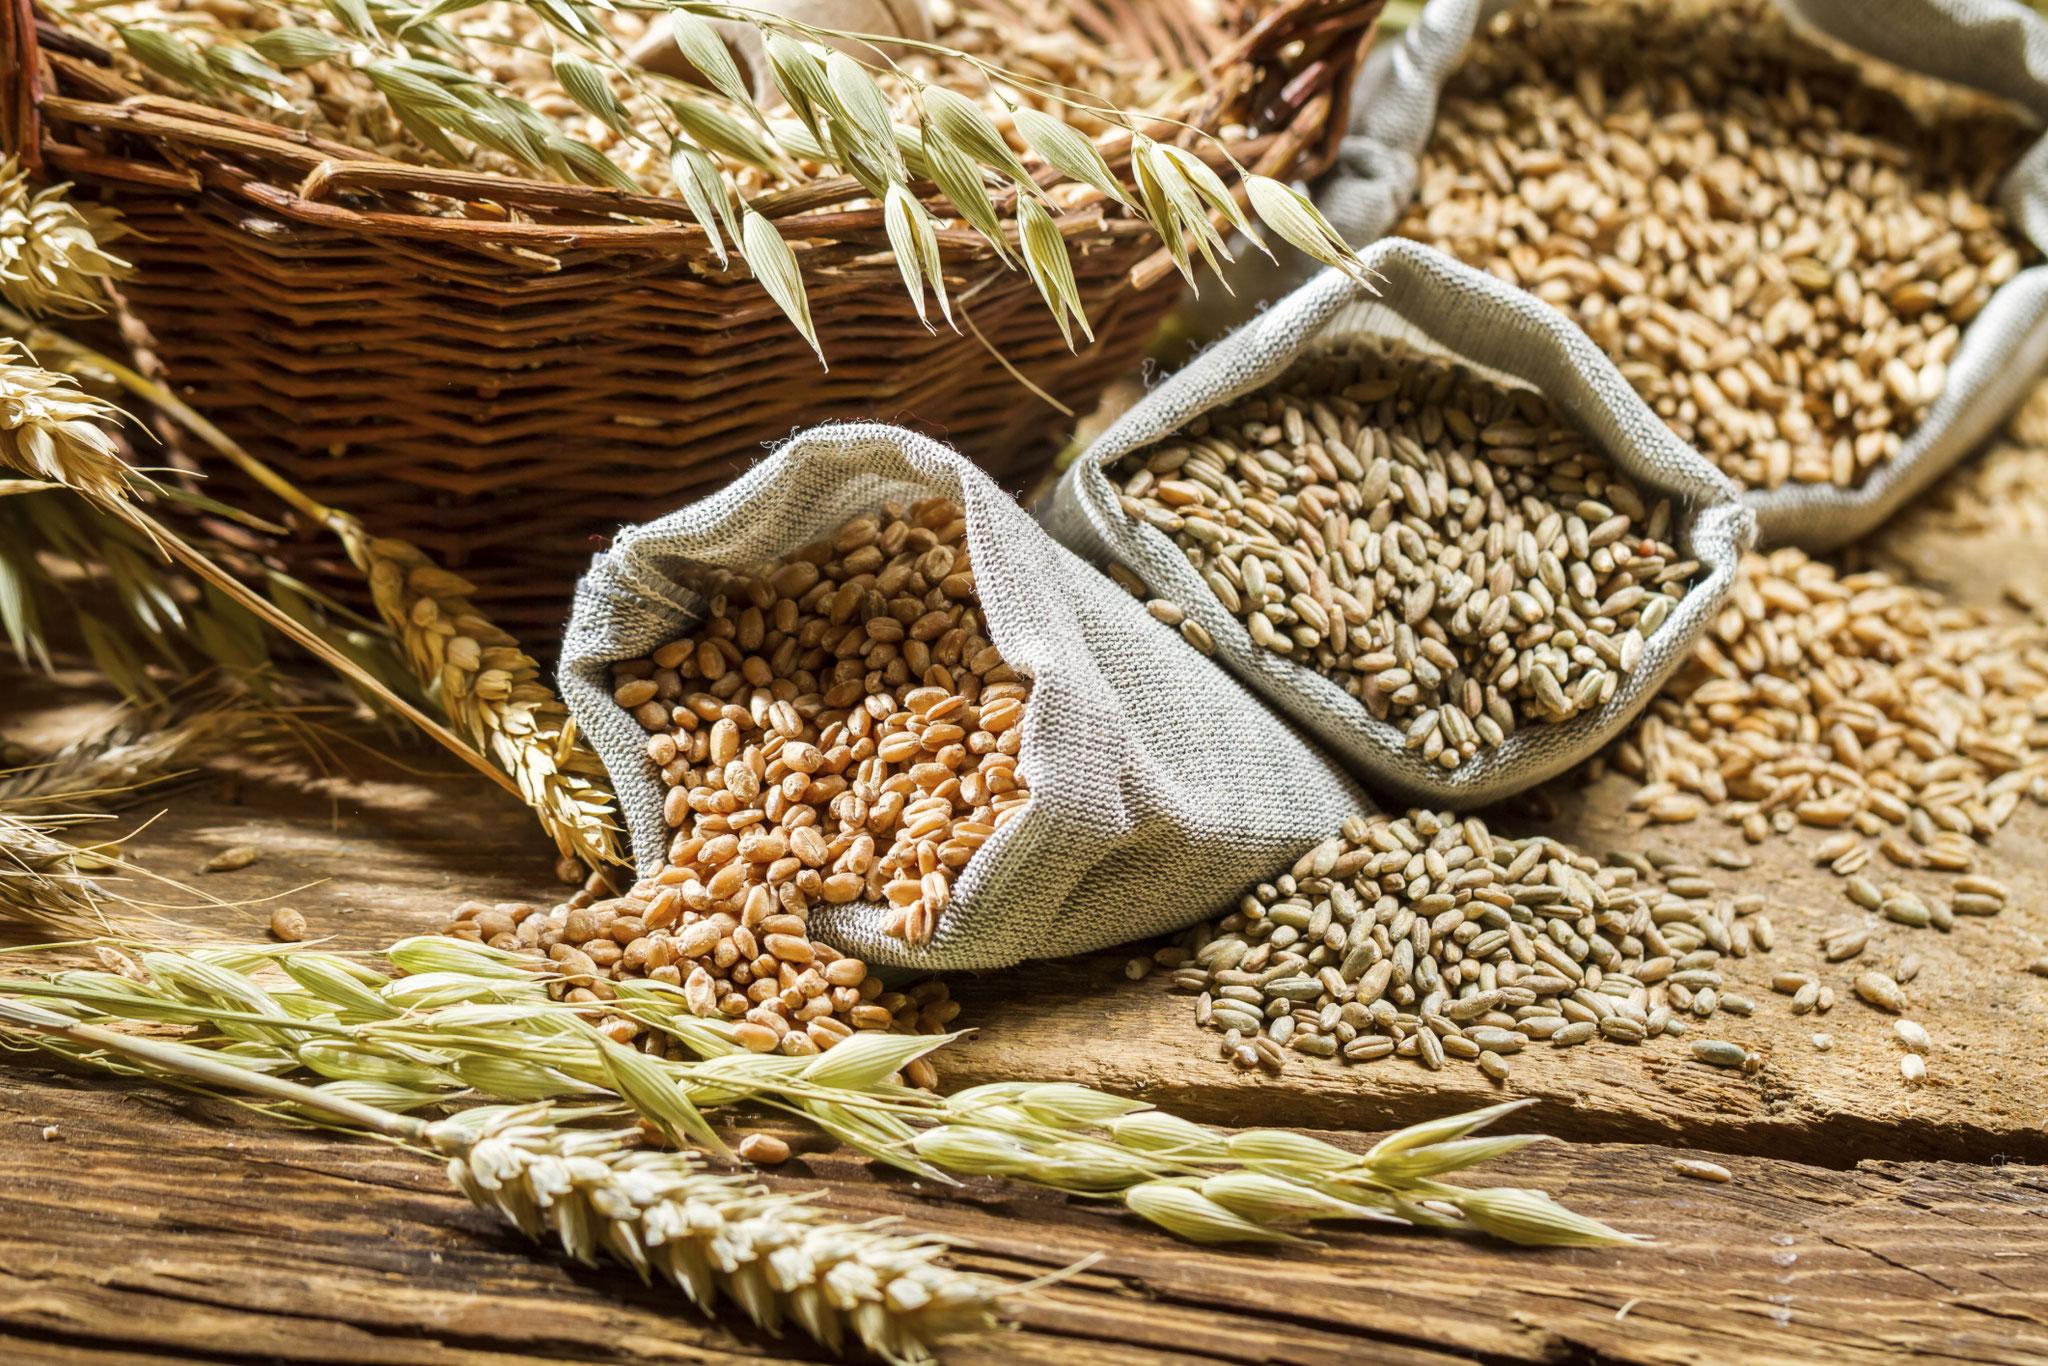 Visita botanica gastronomica: cereali